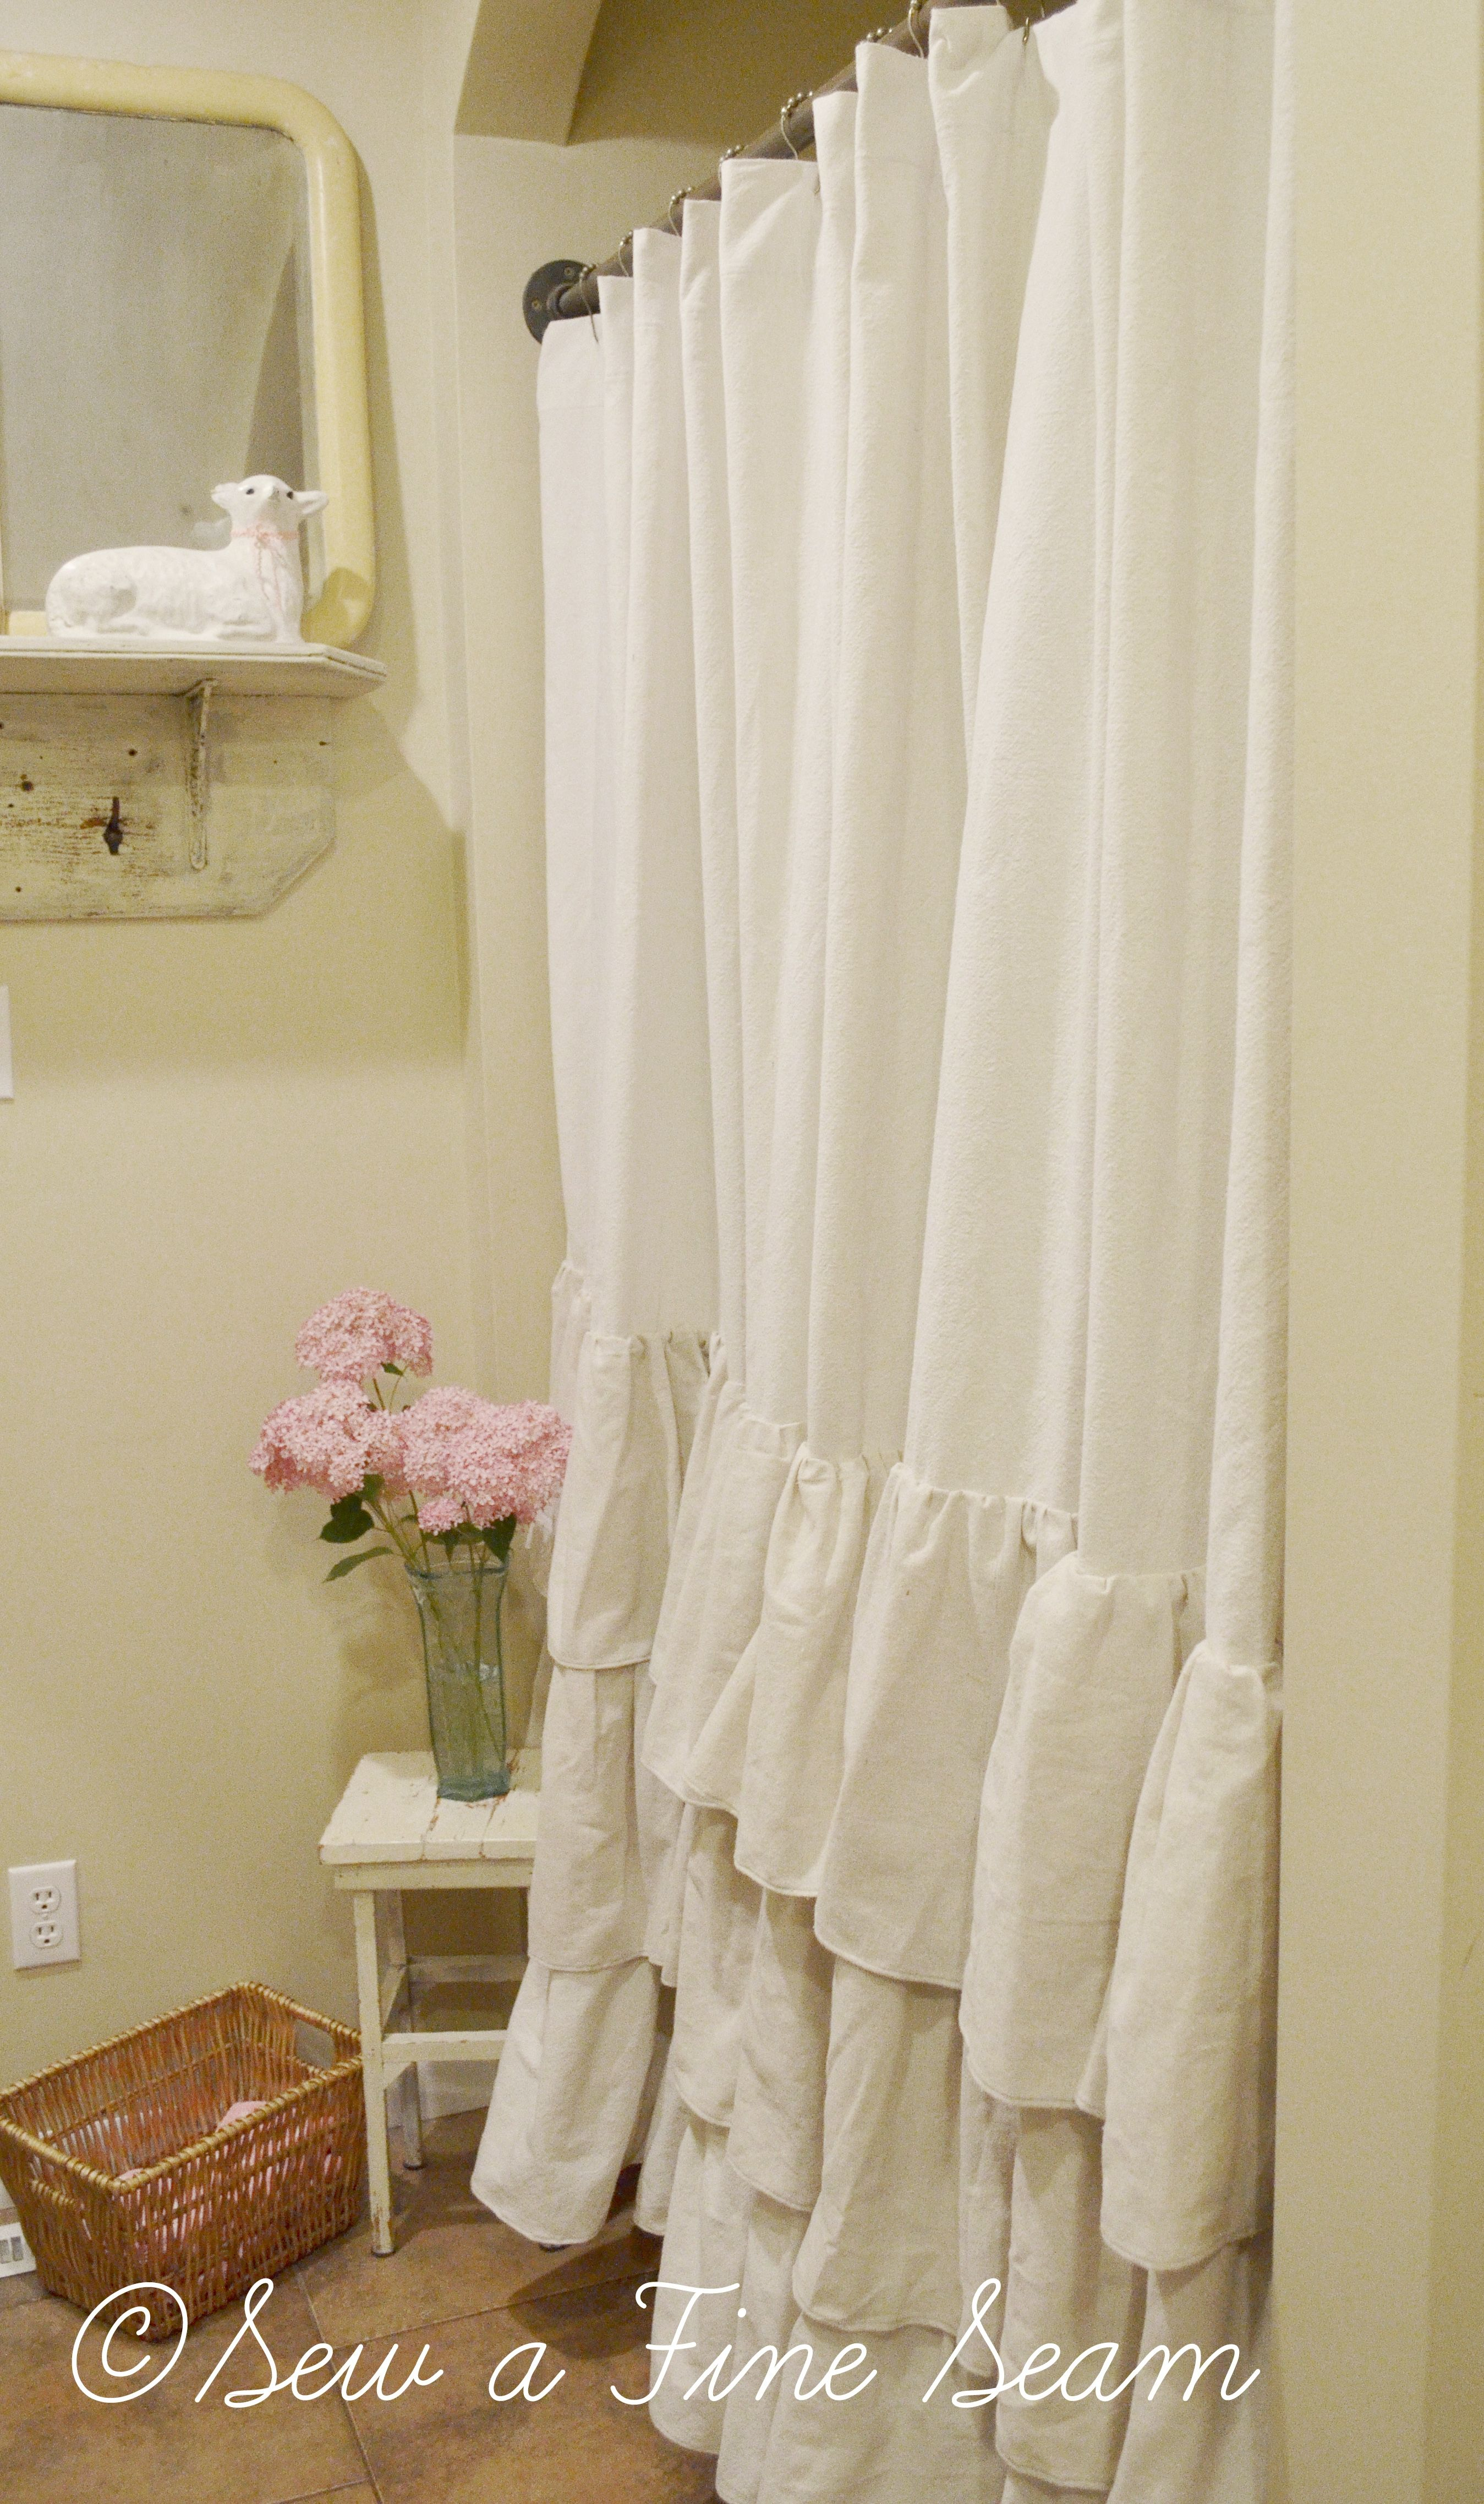 rustic door wooden wayfair bath urban bed shower pdx reviews vintage curtains curtain east home